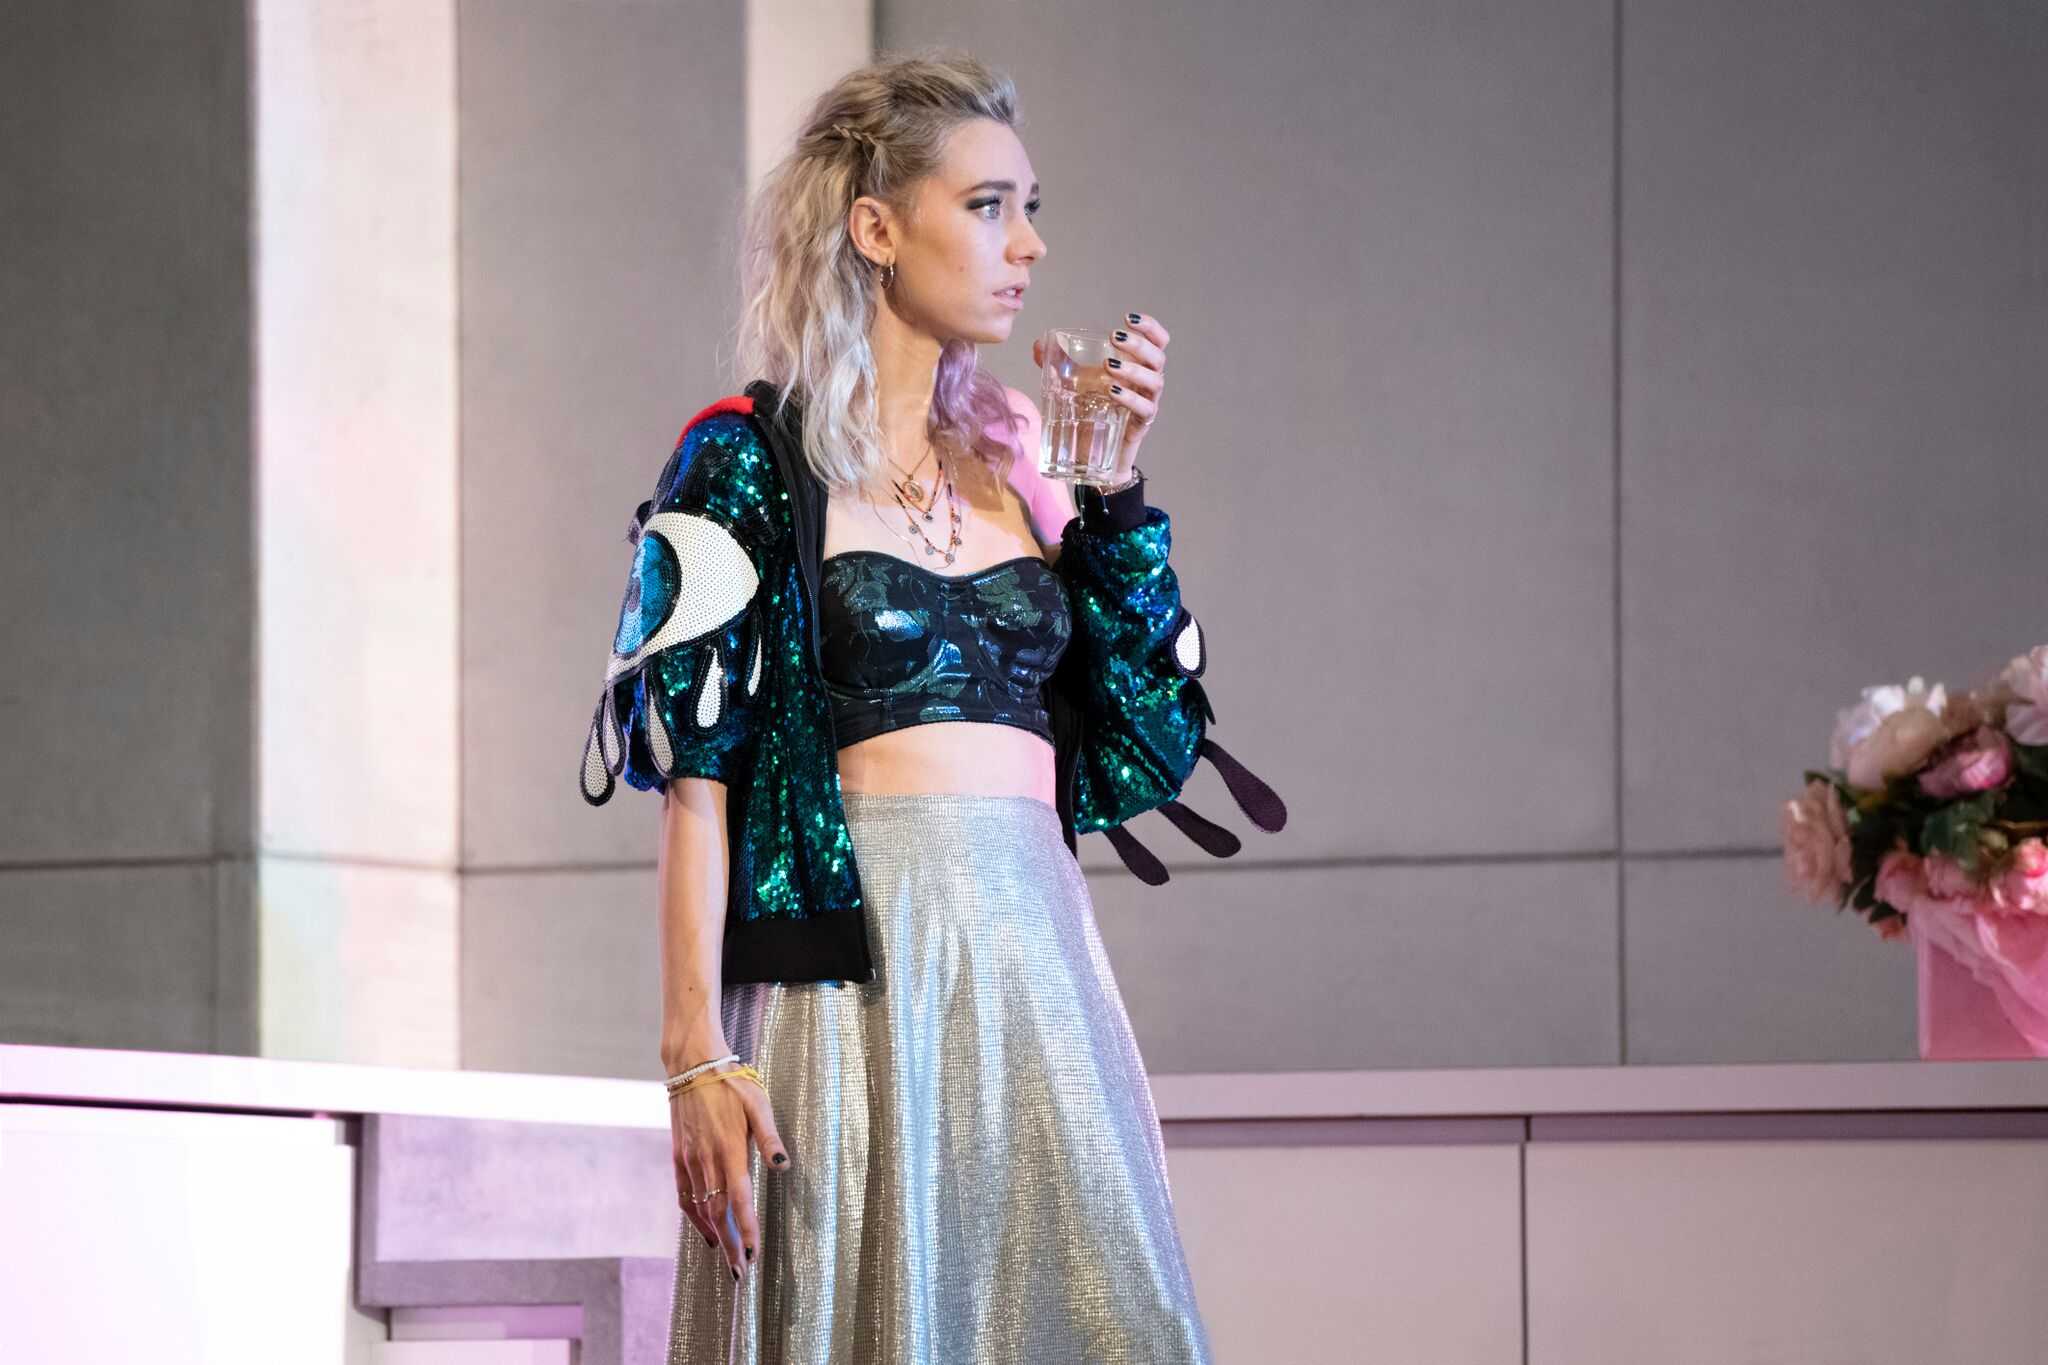 Vanessa Kirby as Julie (photos: Richard H Smith)